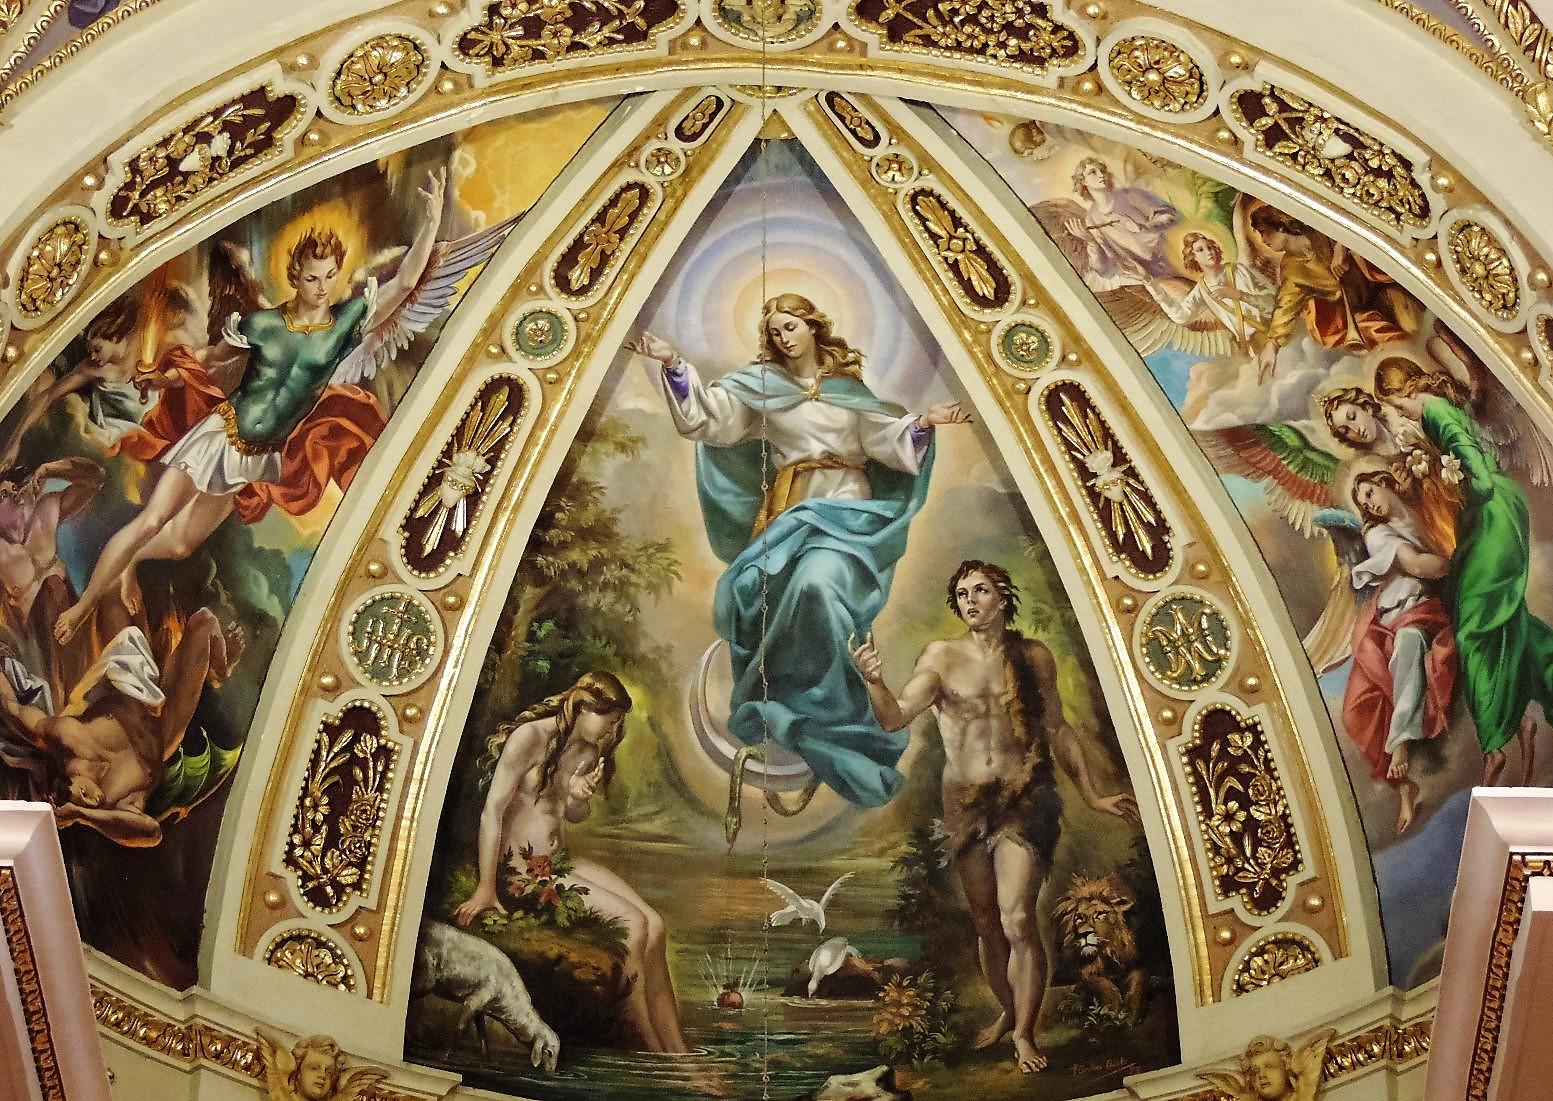 Dun Giljan's Blog: Church ceiling paintings